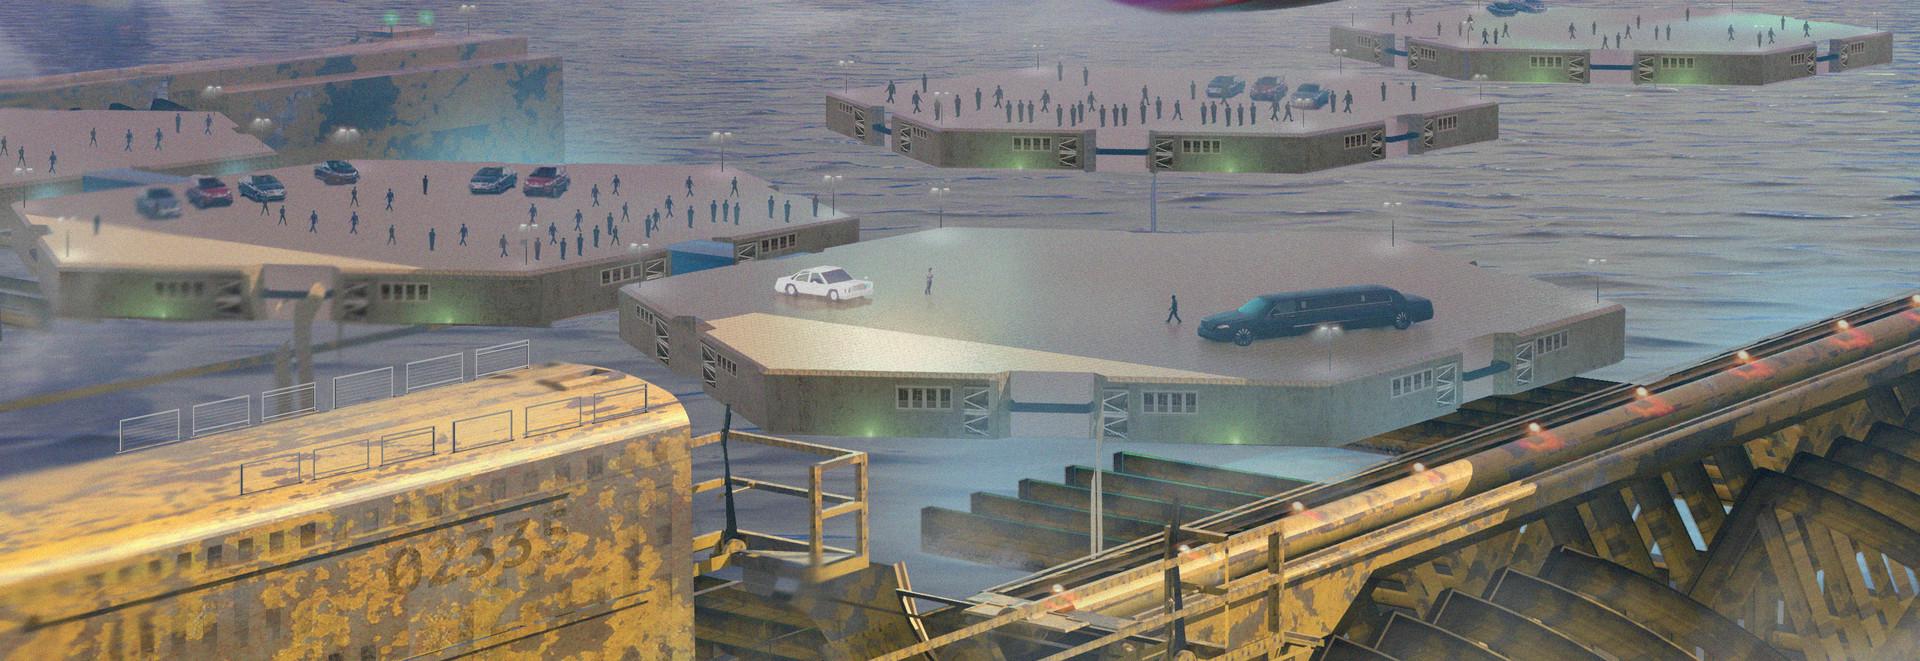 Pace porter zasada scifi dock 26 crop 2